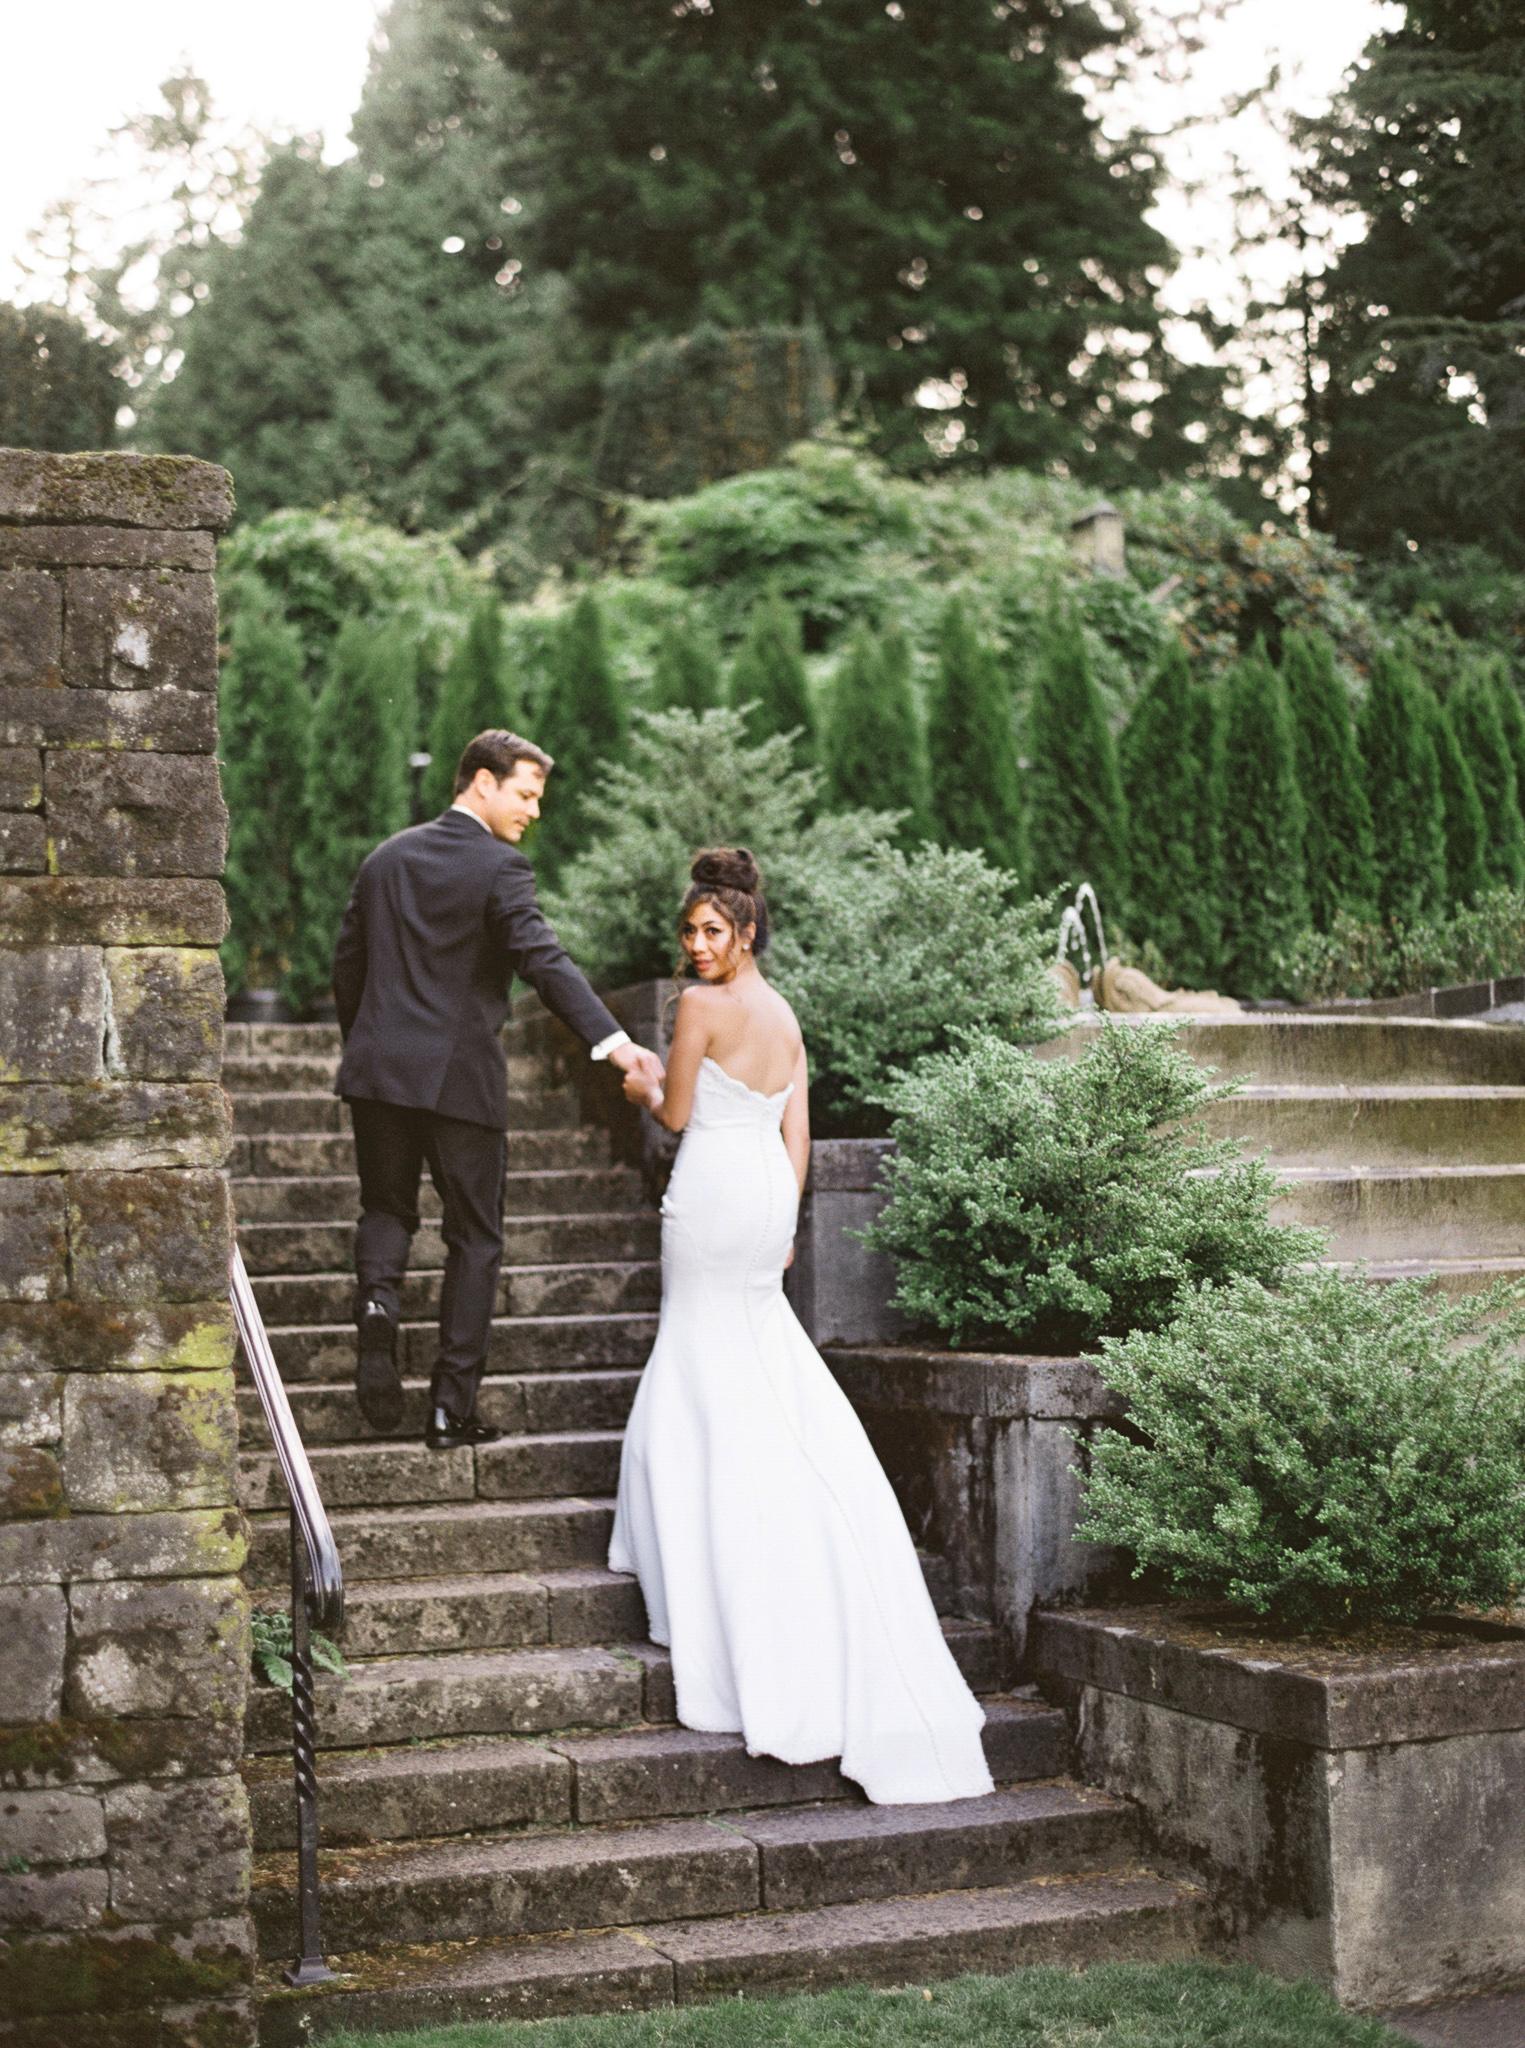 089OutliveCreative_Travel_Photographer_Videographer_Lewis&Clark_Oregon_Elegant_BlackTie_Destination_Wedding.jpg